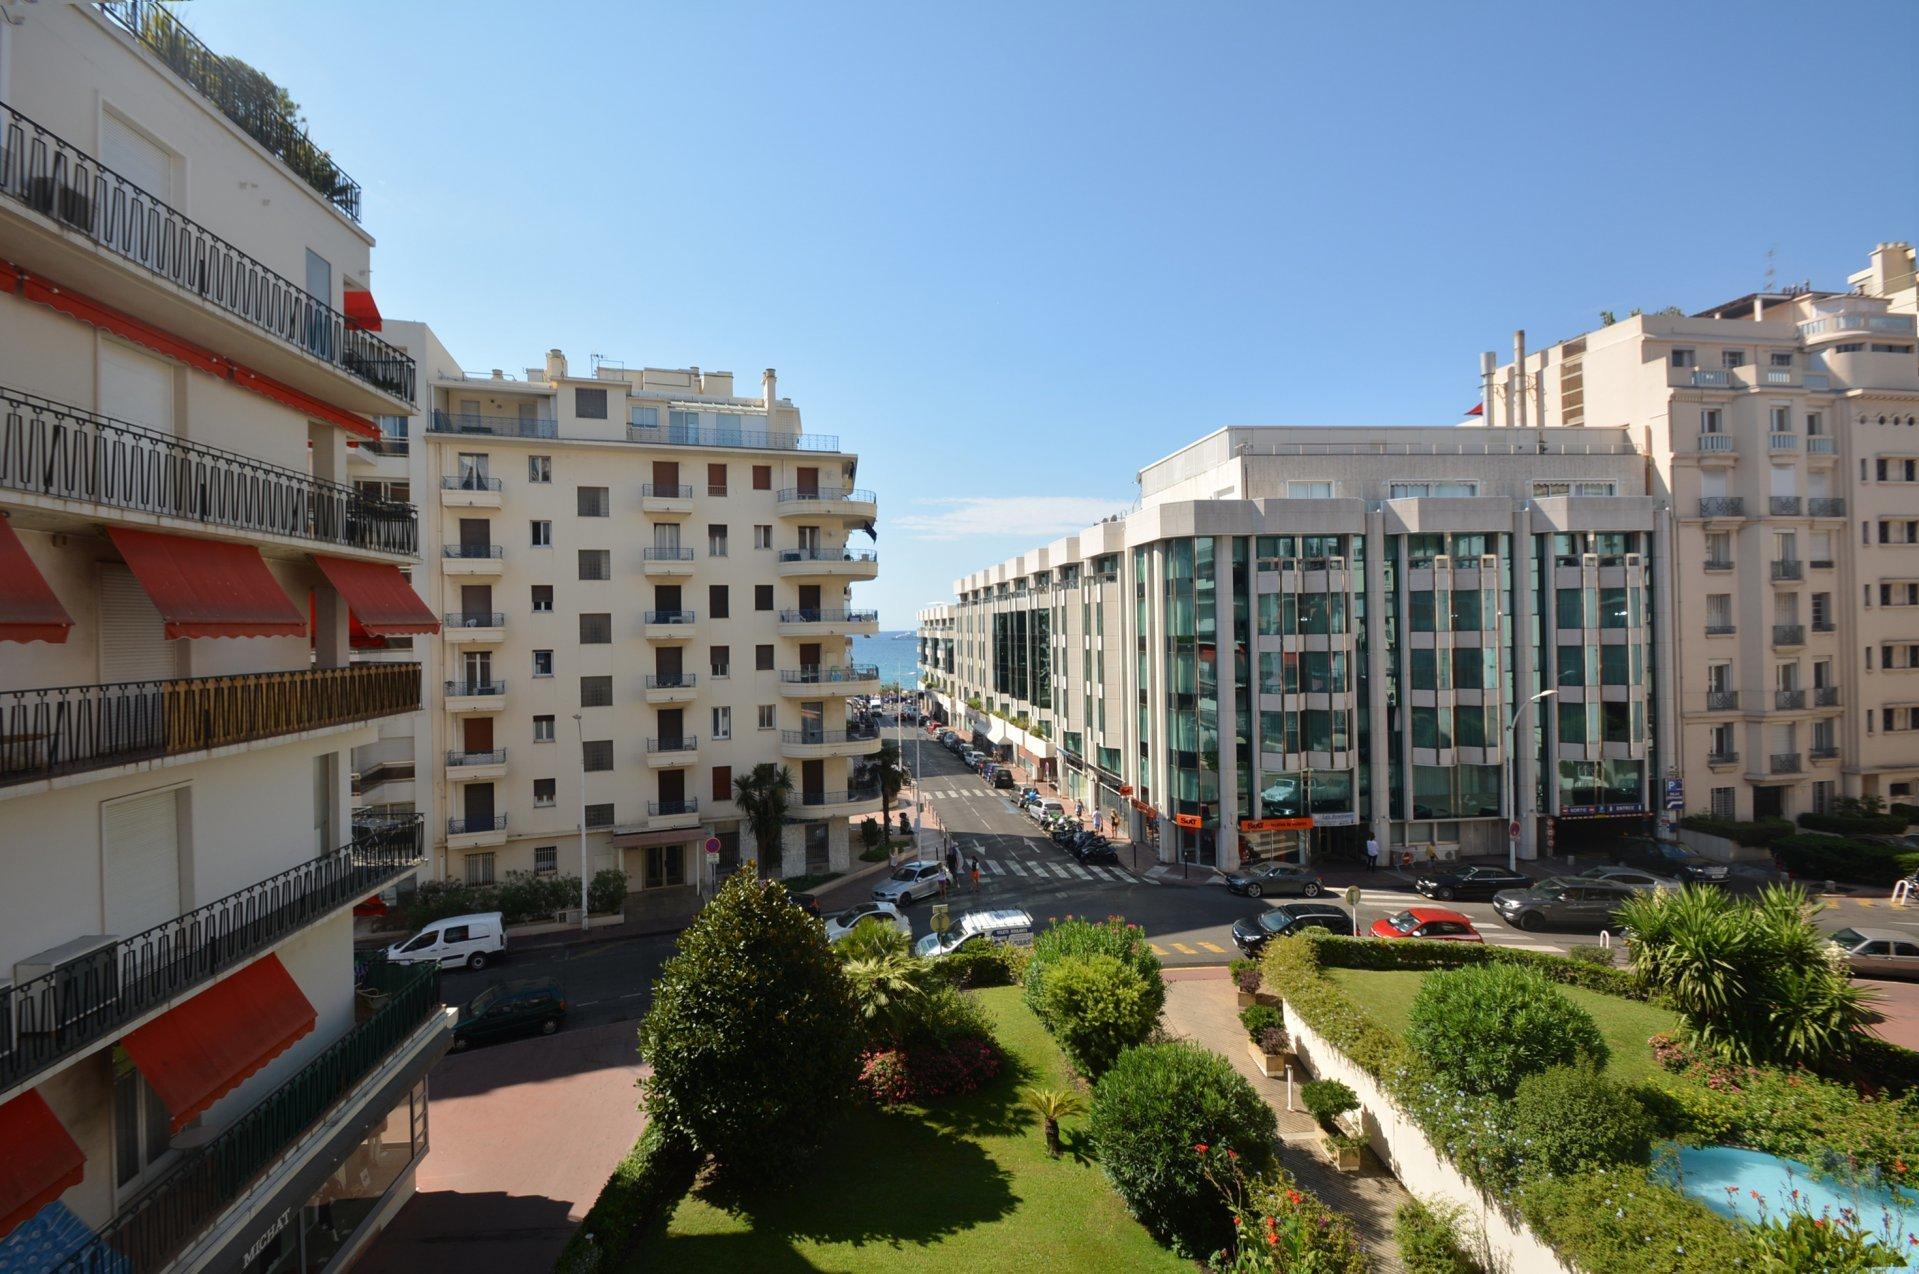 Apartment in Cannes, Provence-Alpes-Côte d'Azur, France 1 - 10761214